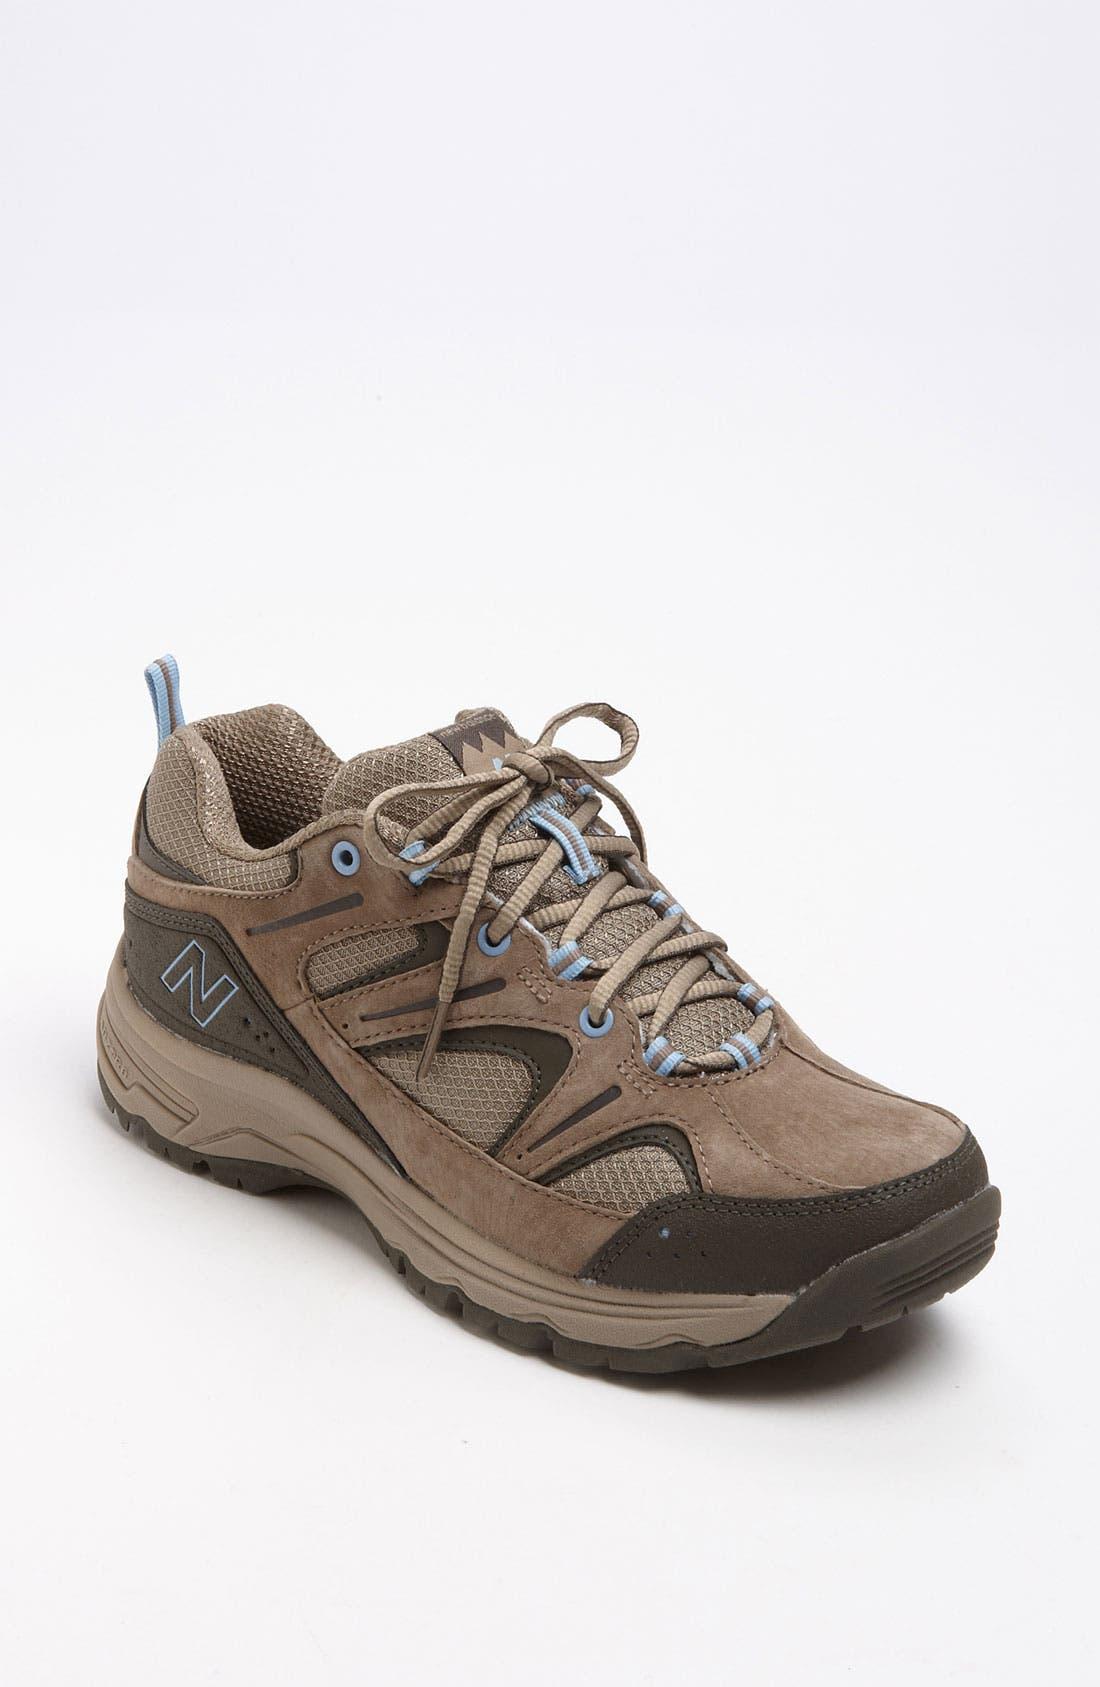 new balance 759 walking shoe